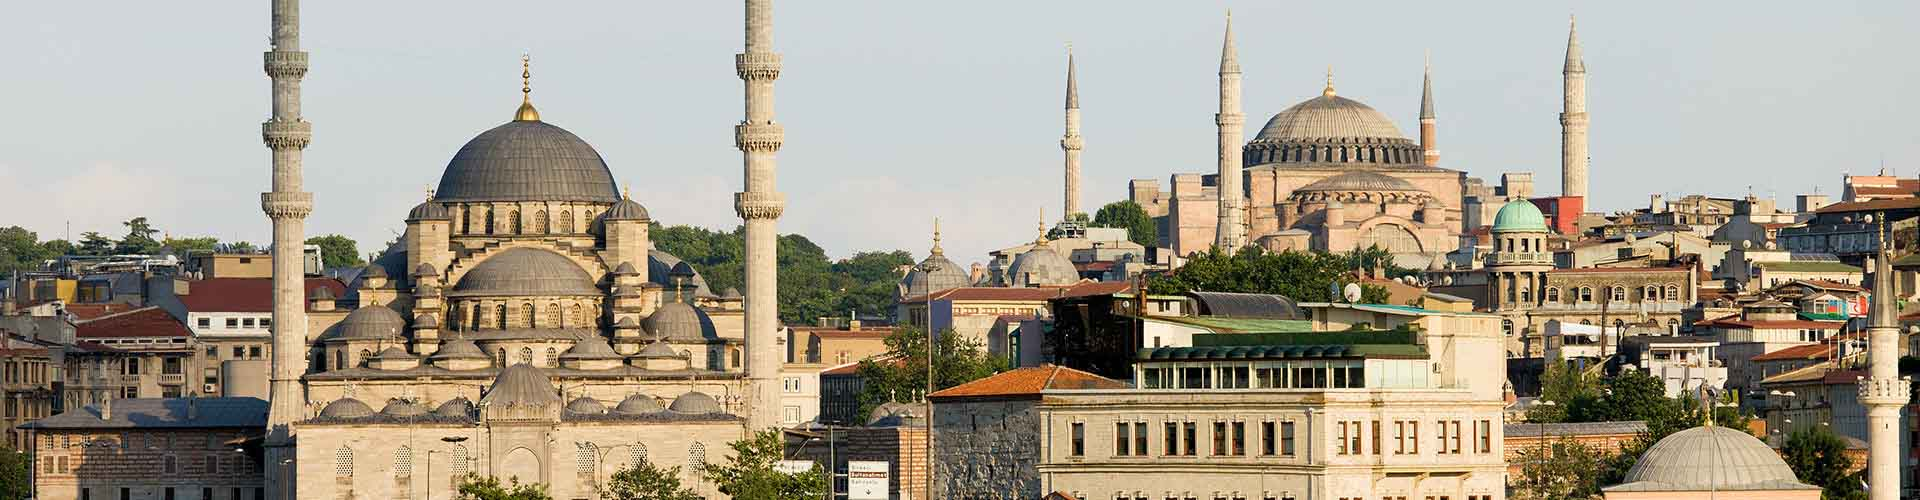 Istambul – Camping próximos de Aeroporto Internacional Atatürk. Mapas para Istambul, Fotos e Avaliações para cada camping em Istambul.